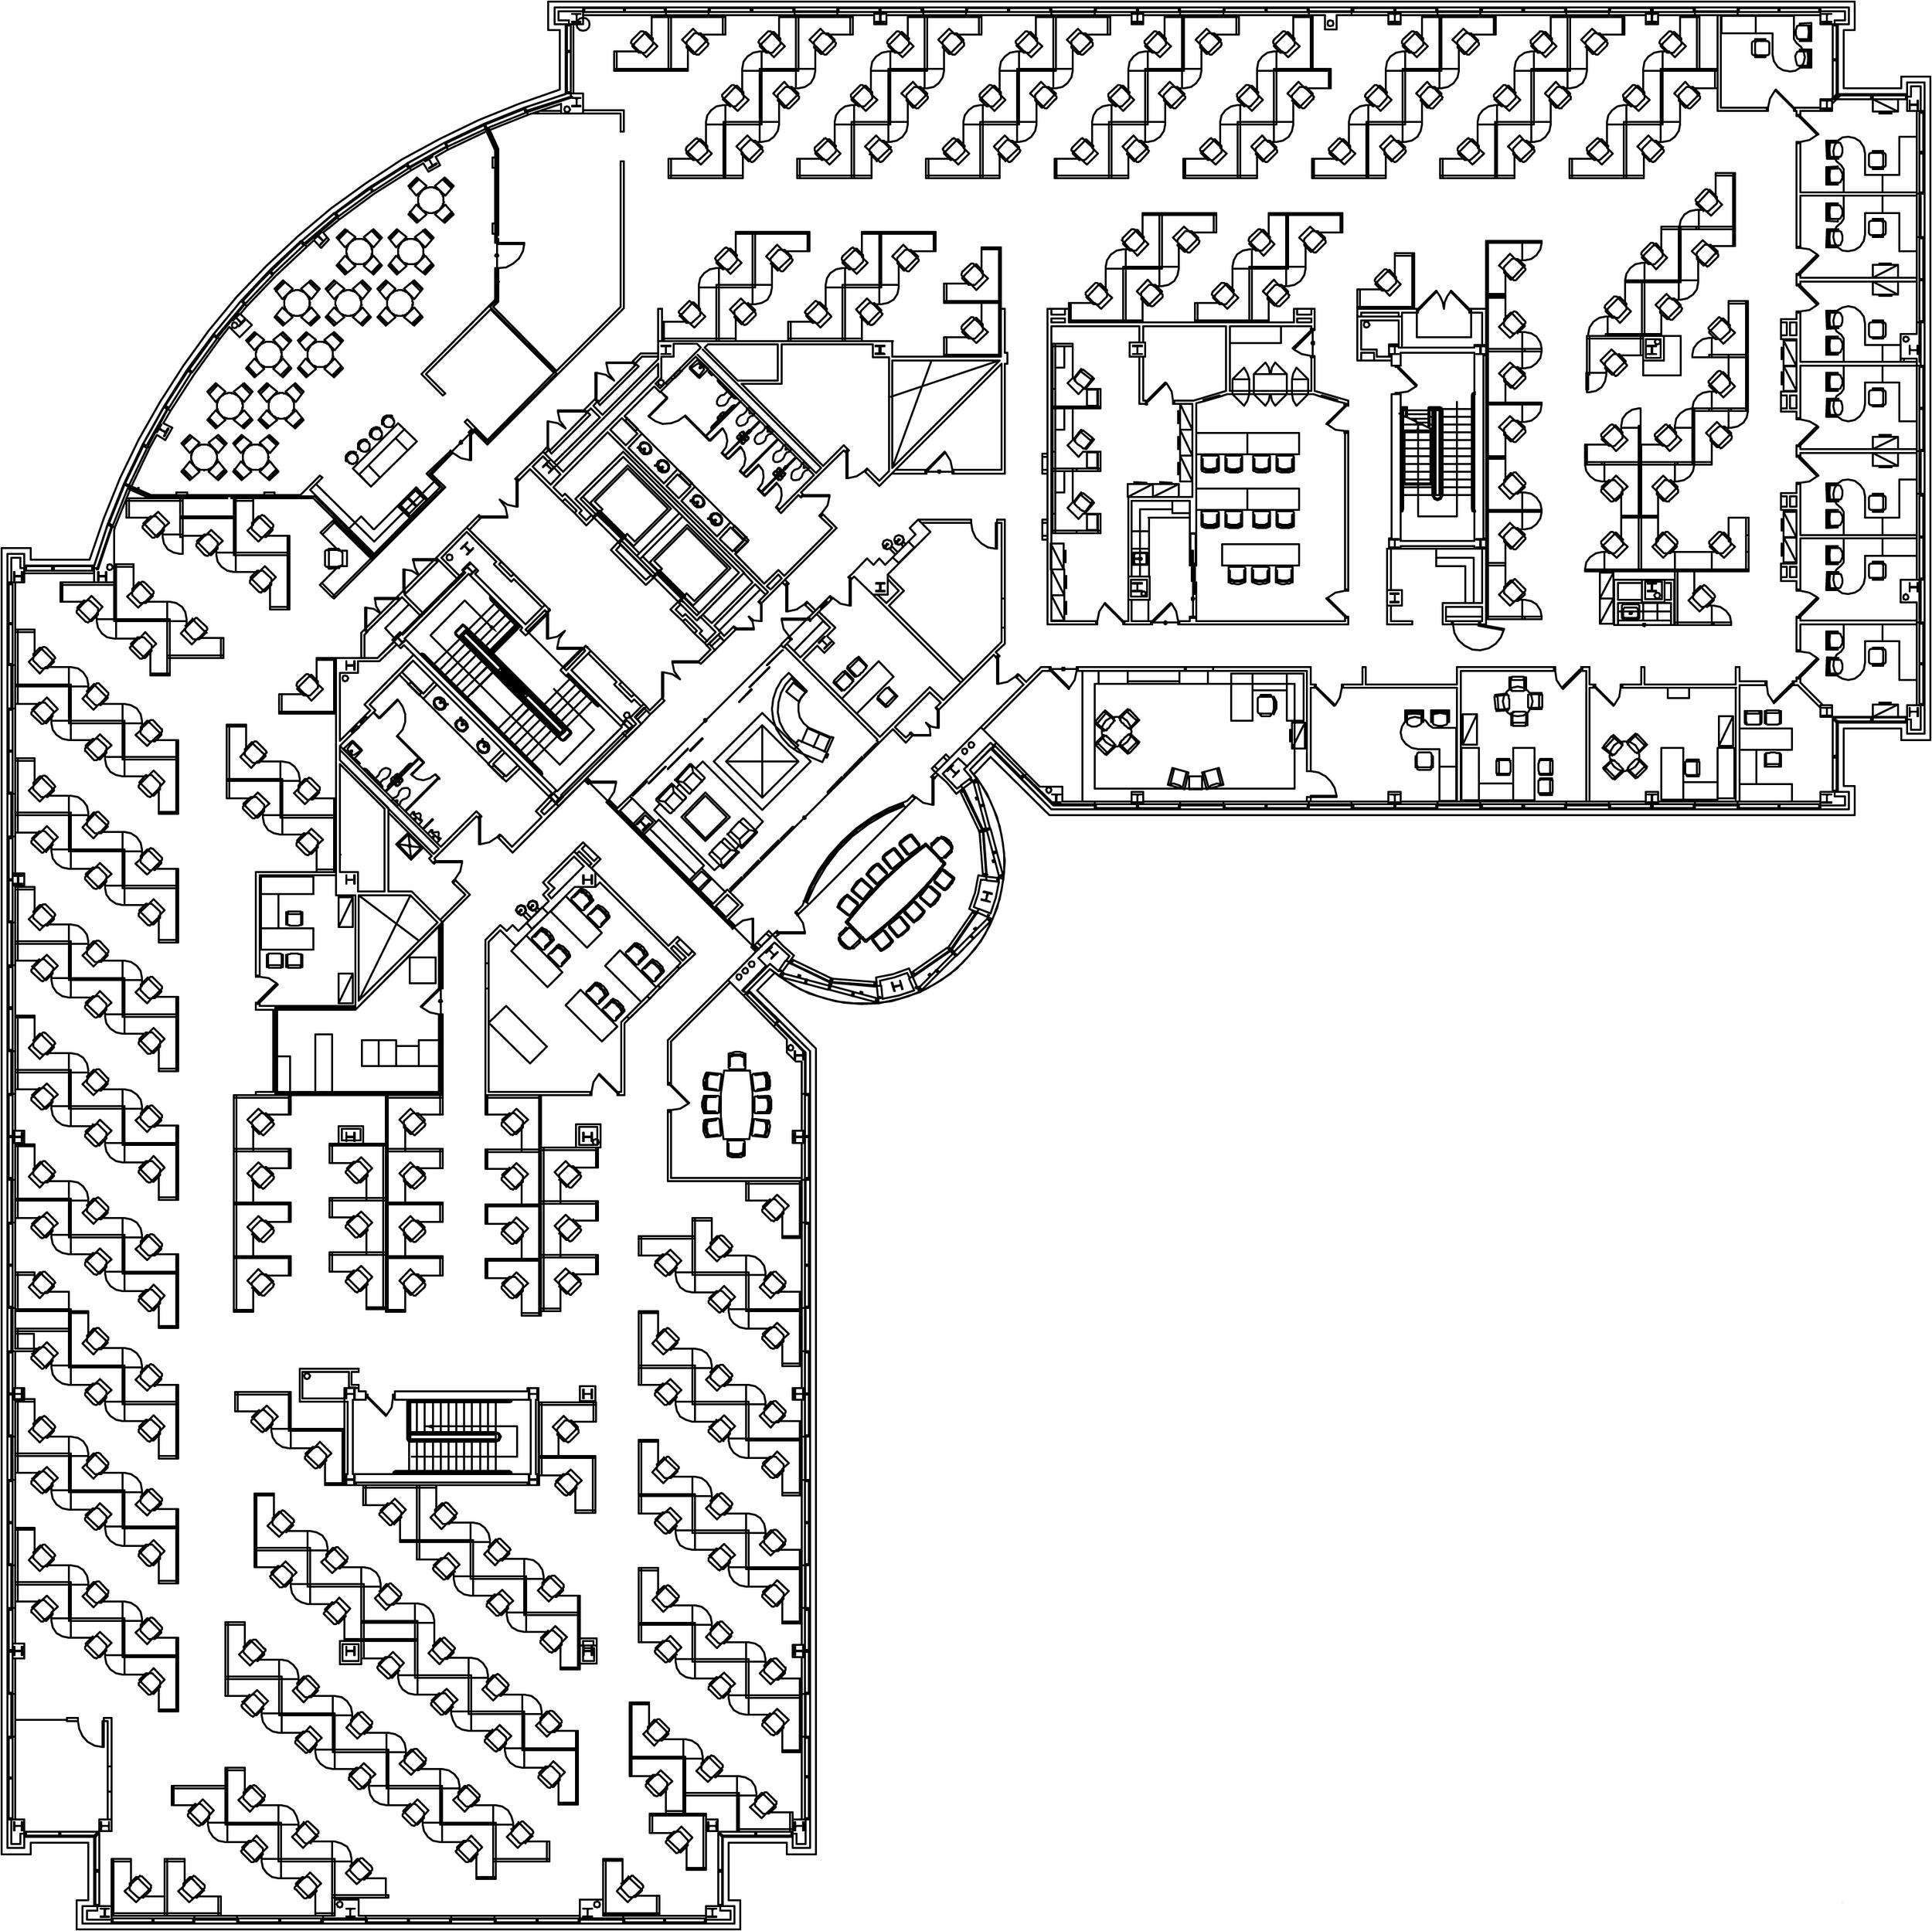 Customer Service Center - 30,000 USF